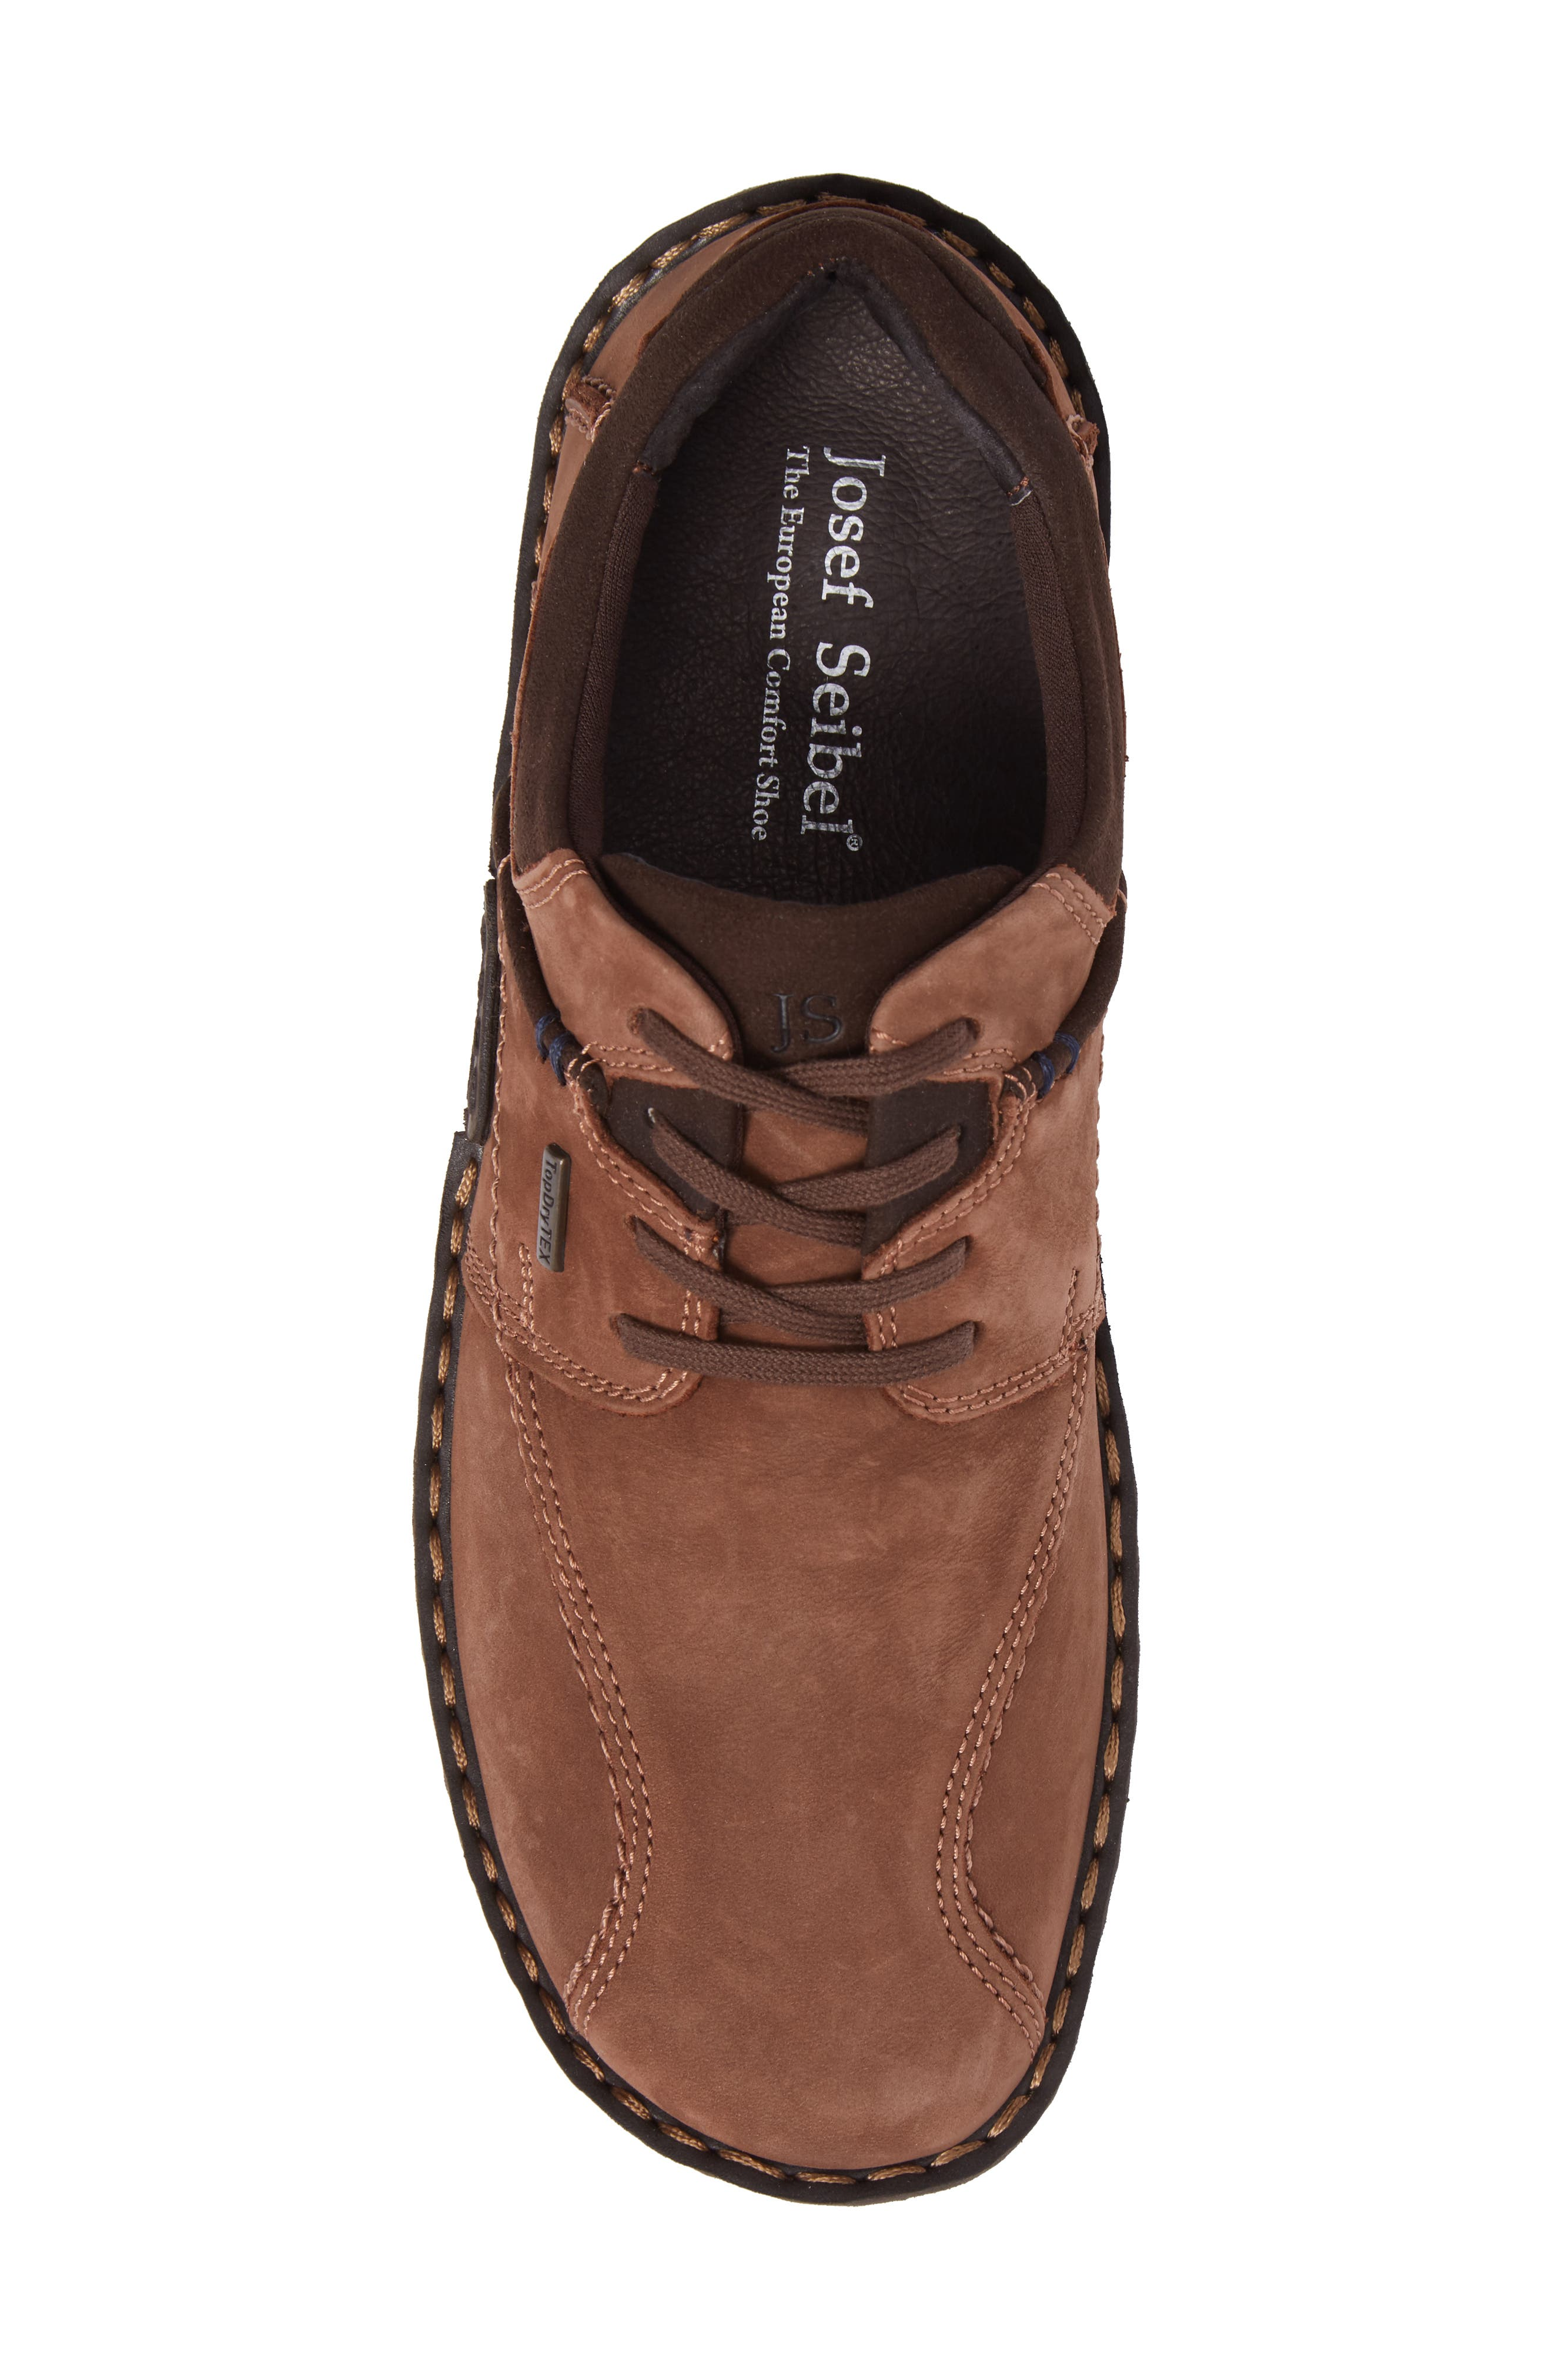 Willow Waterproof Sneaker,                             Alternate thumbnail 5, color,                             Castagne